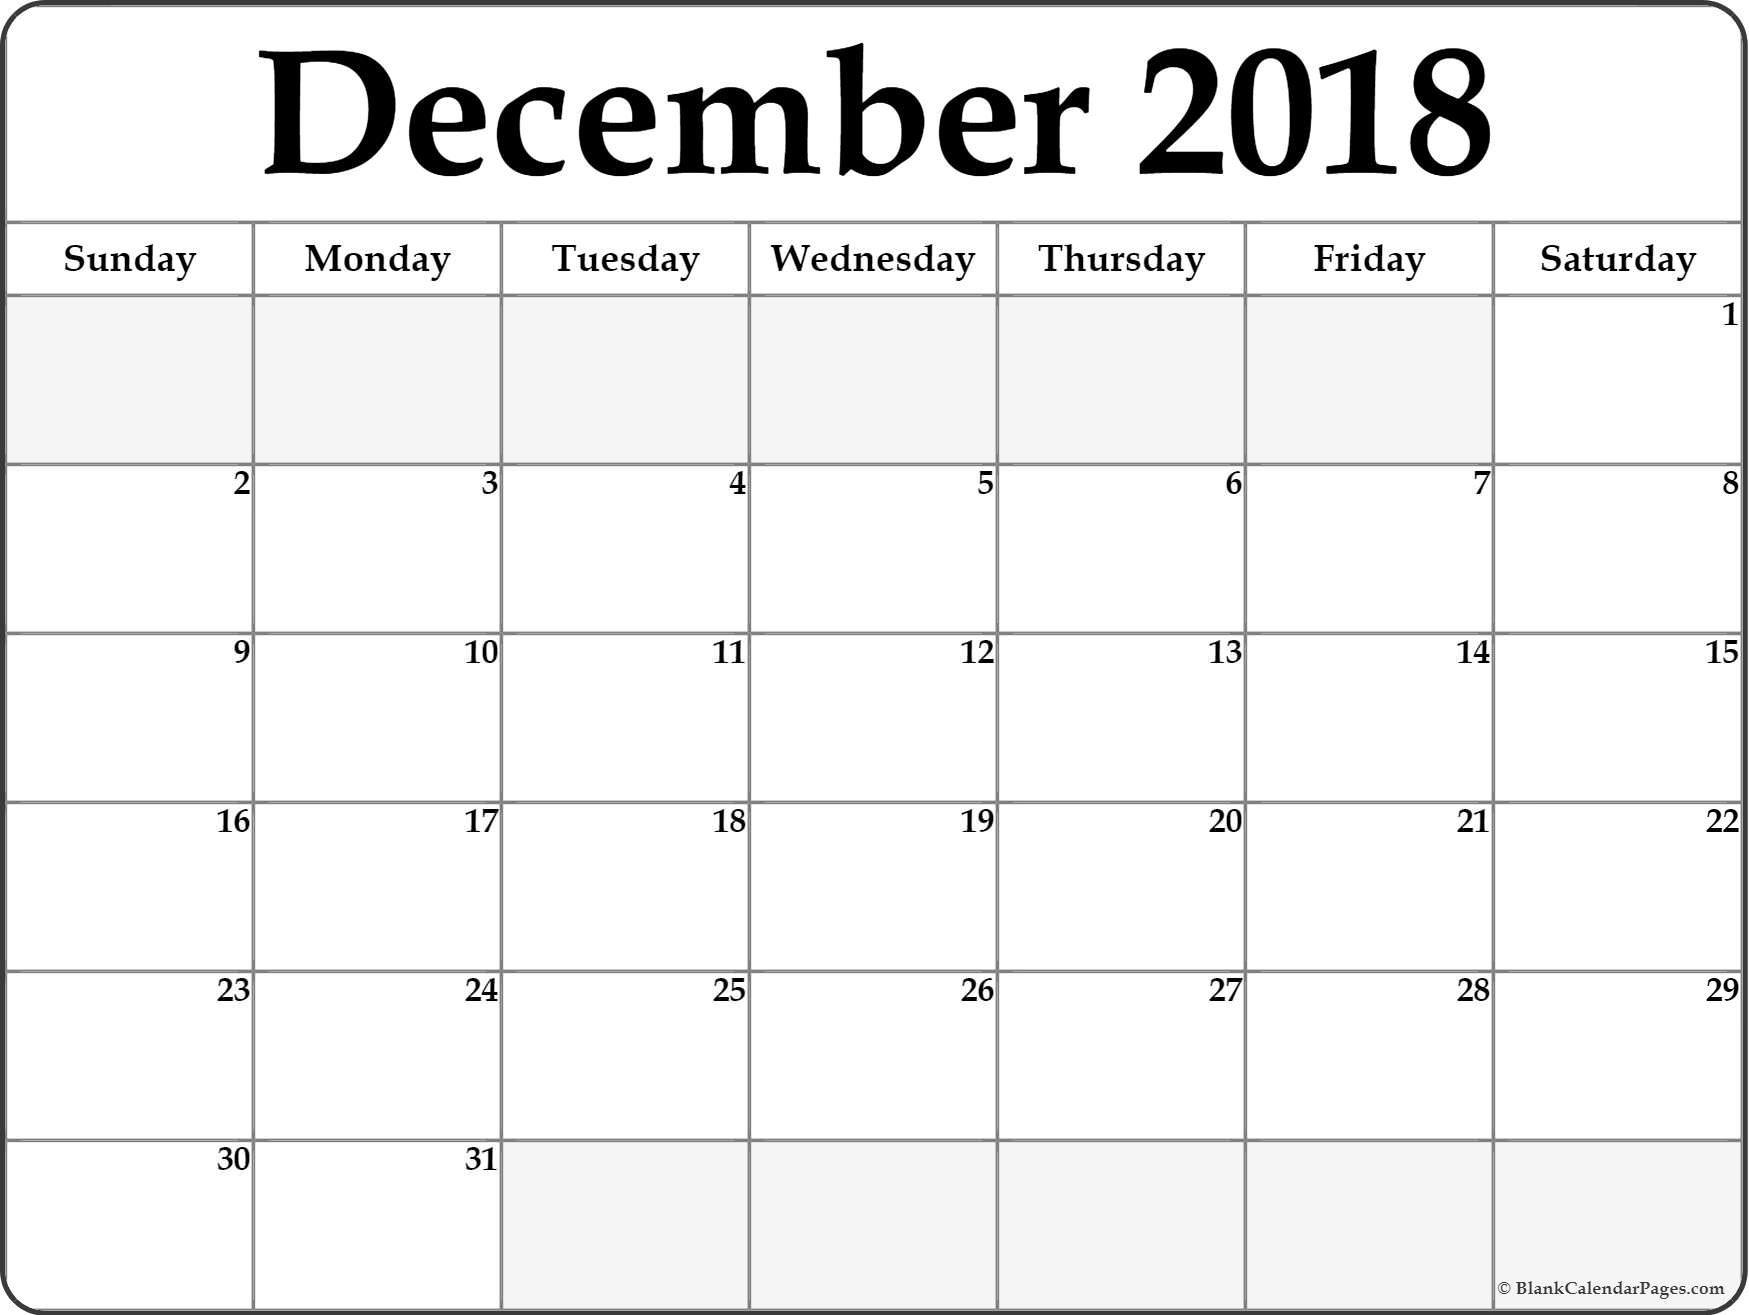 December 2018 Blank Calendar . December 2018 Calendar Printable with regard to Printable Blank Calendar For December